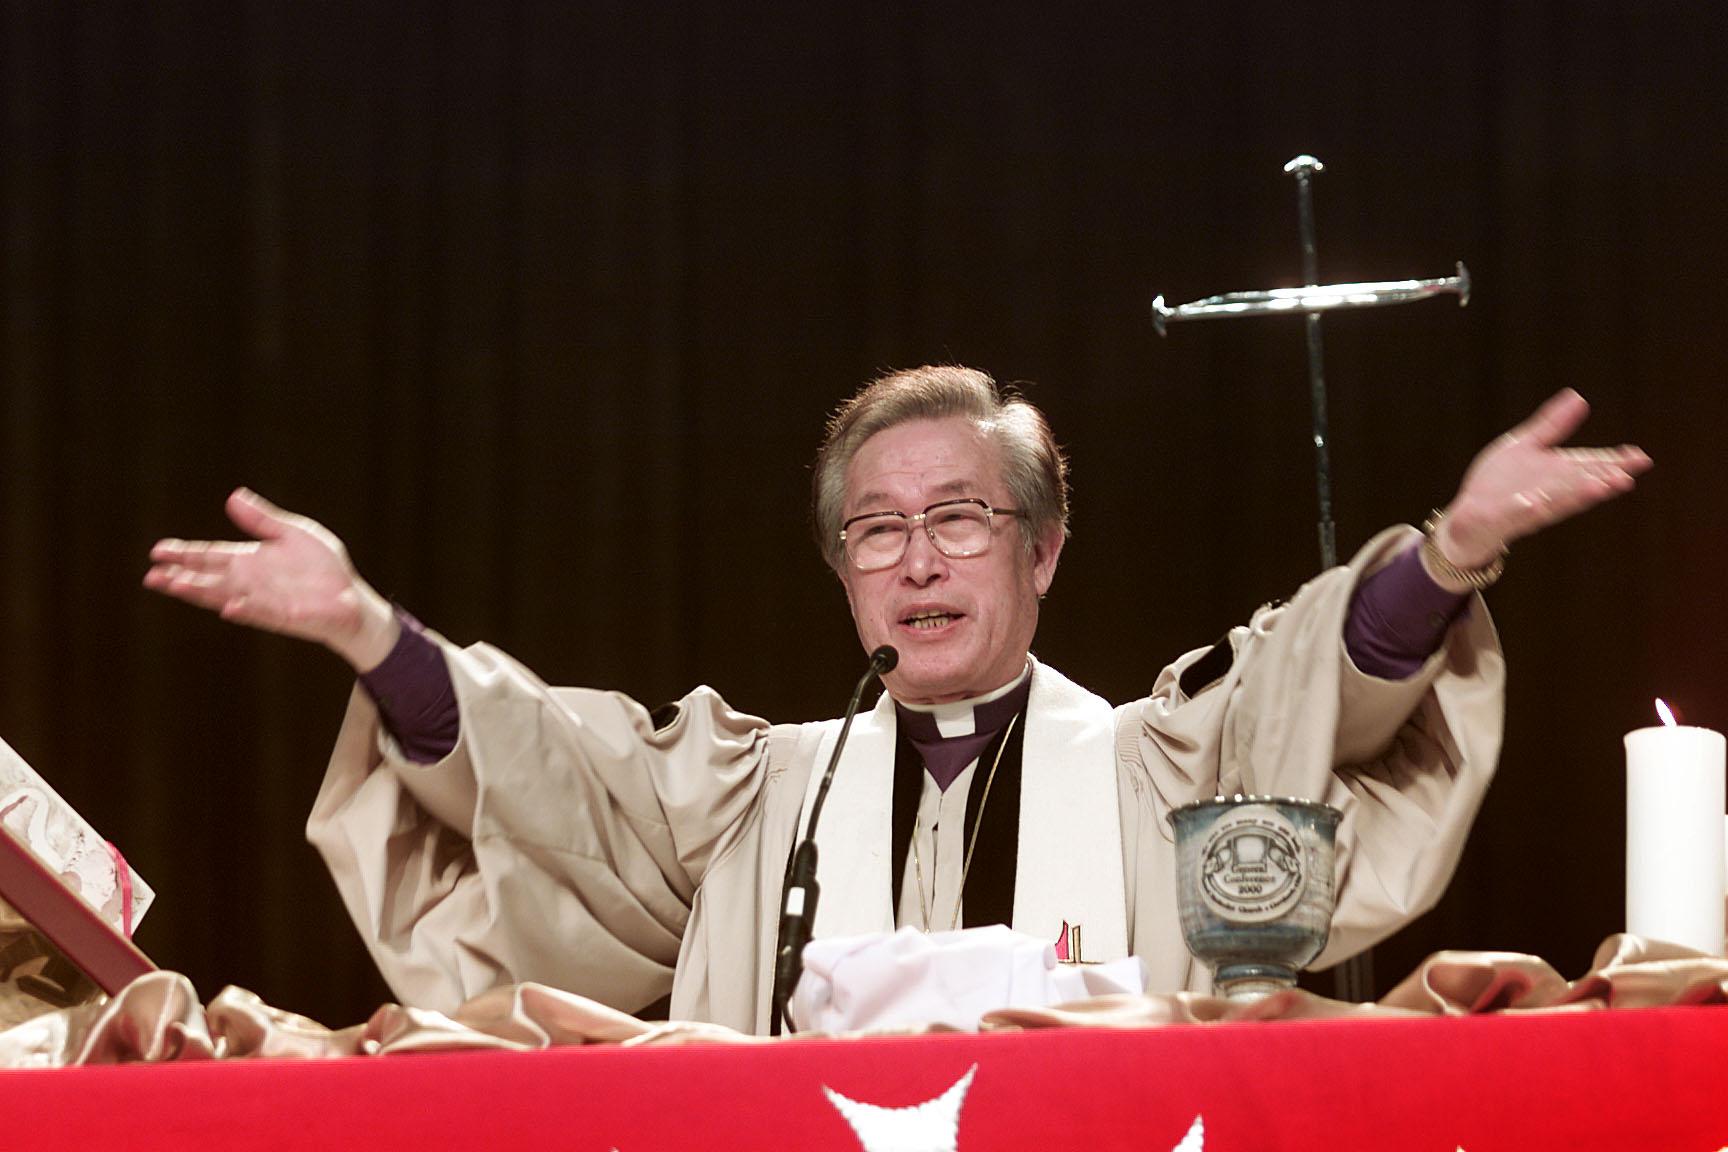 A United Methodist Bishop's Reading List - Juicy Ecumenism